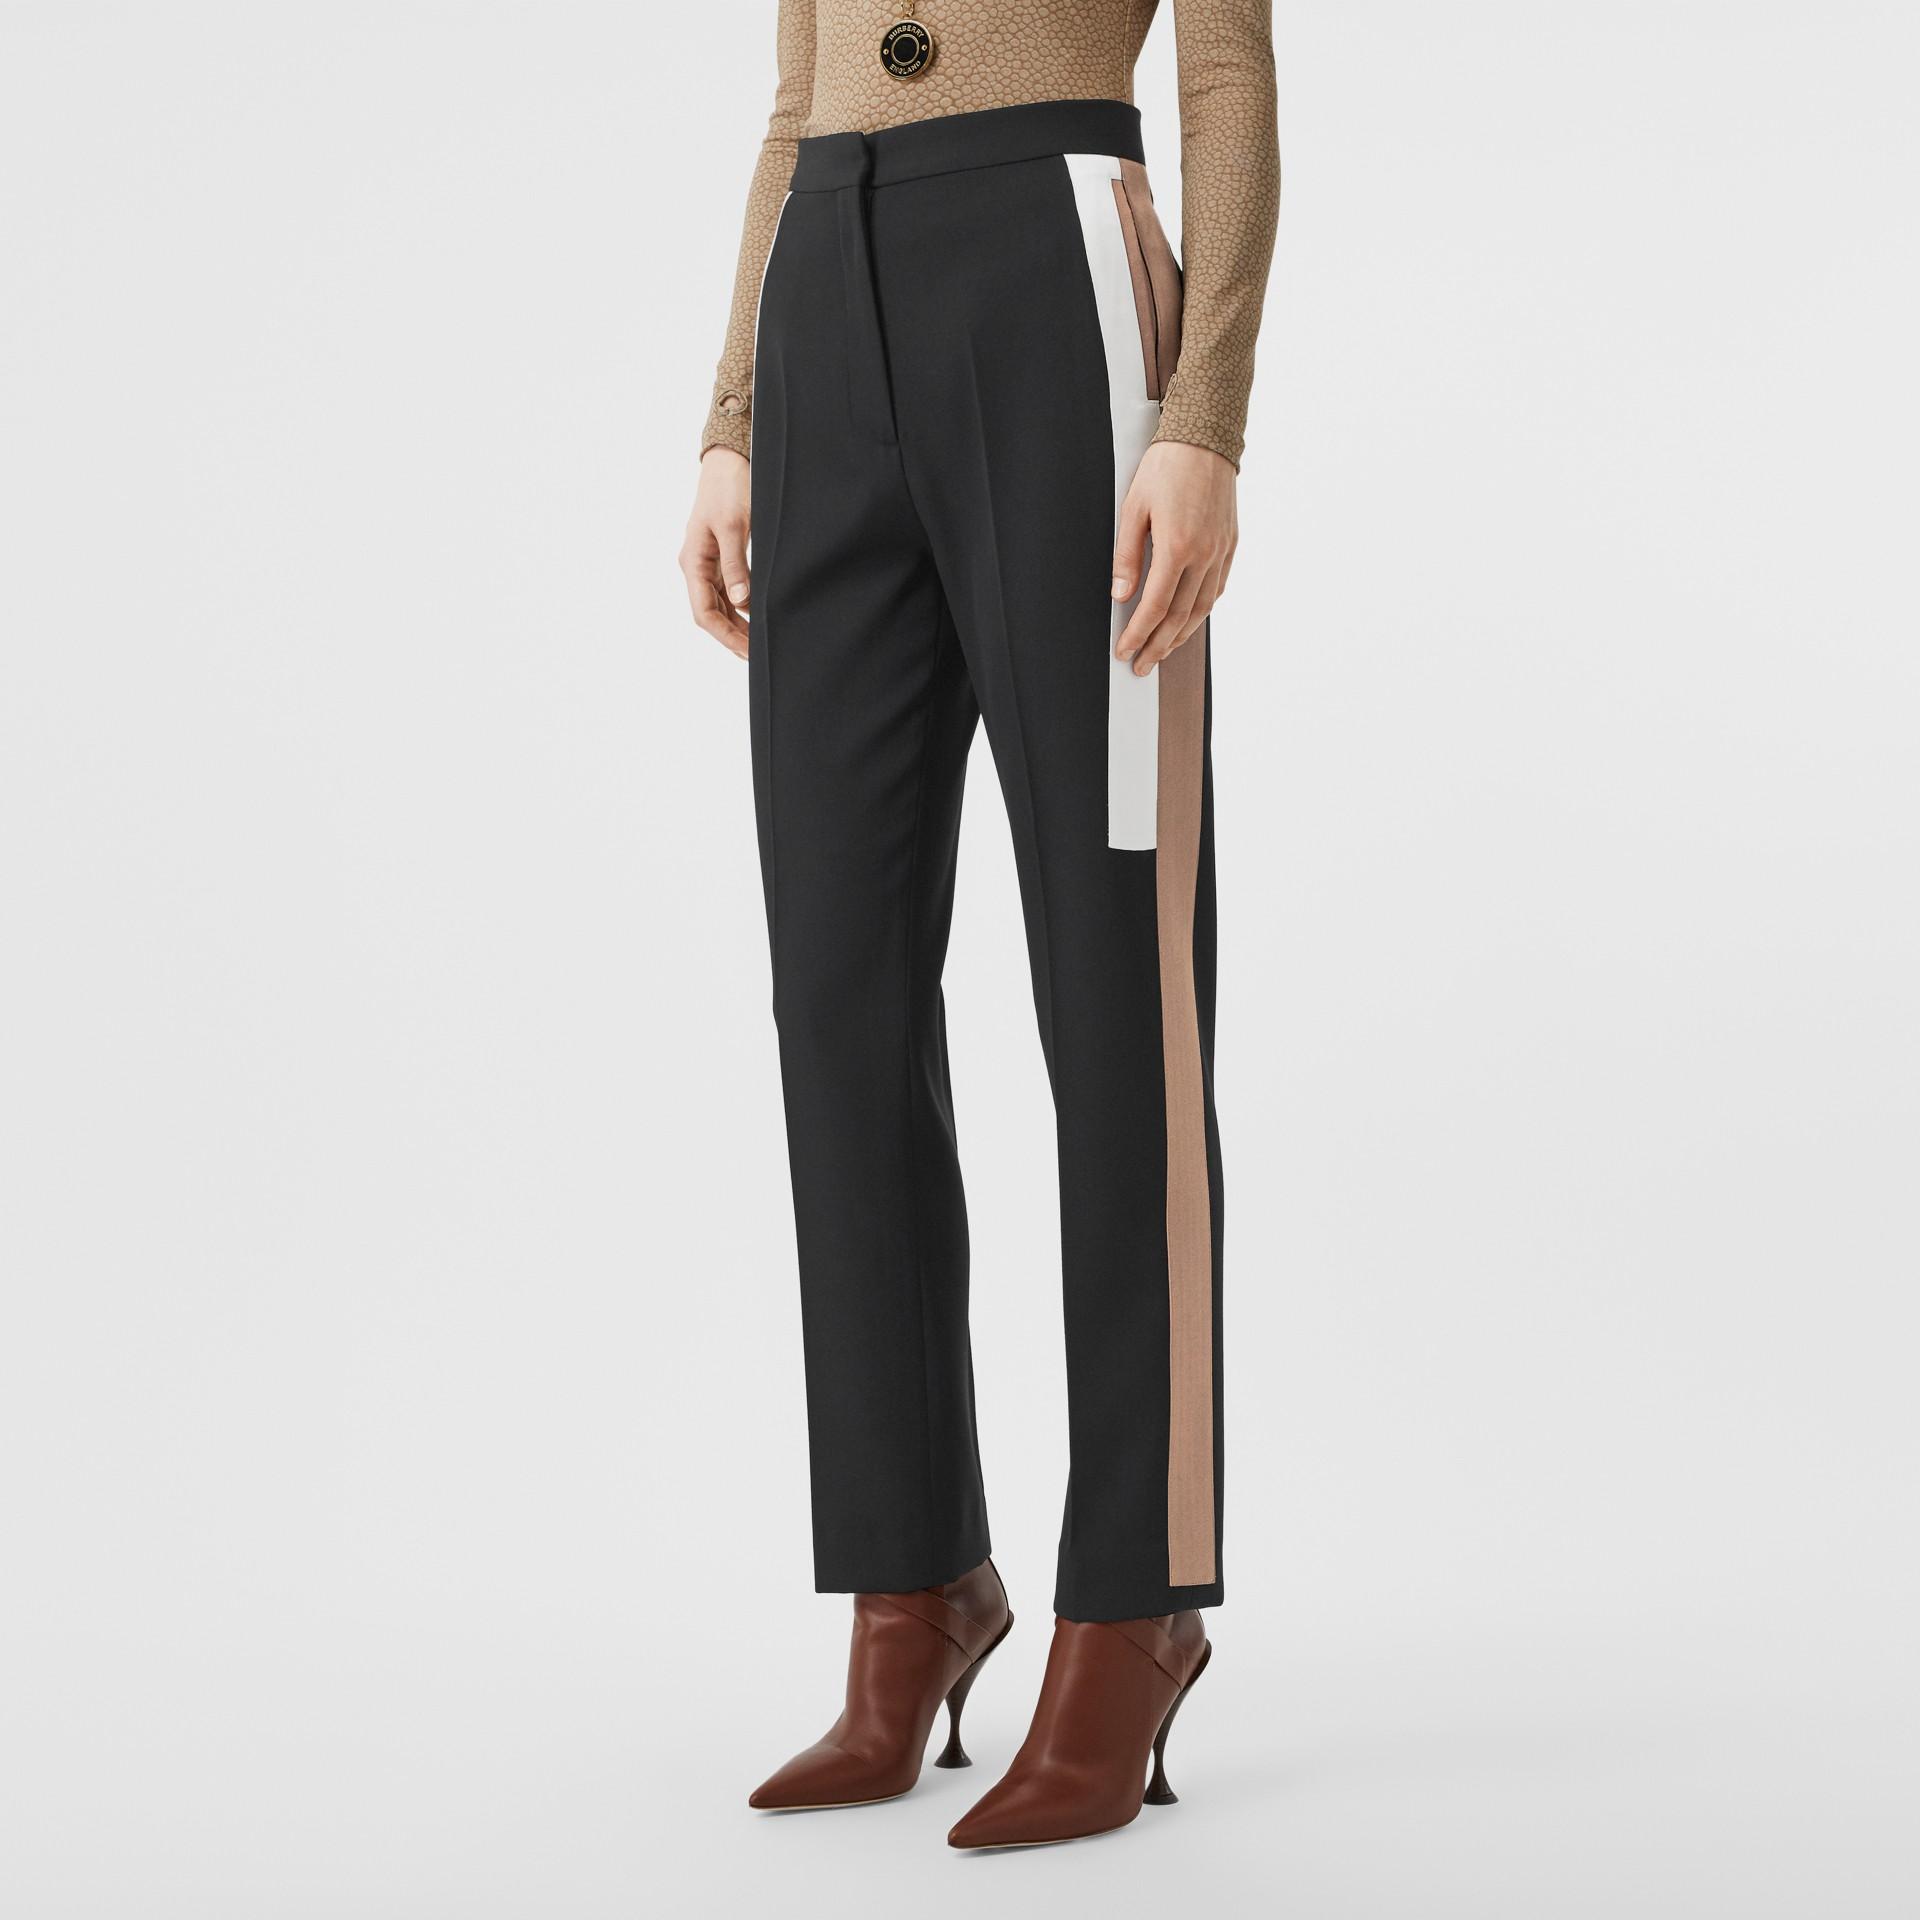 Stripe Detail Wool Tailored Trousers in Black - Women | Burberry United Kingdom - gallery image 4